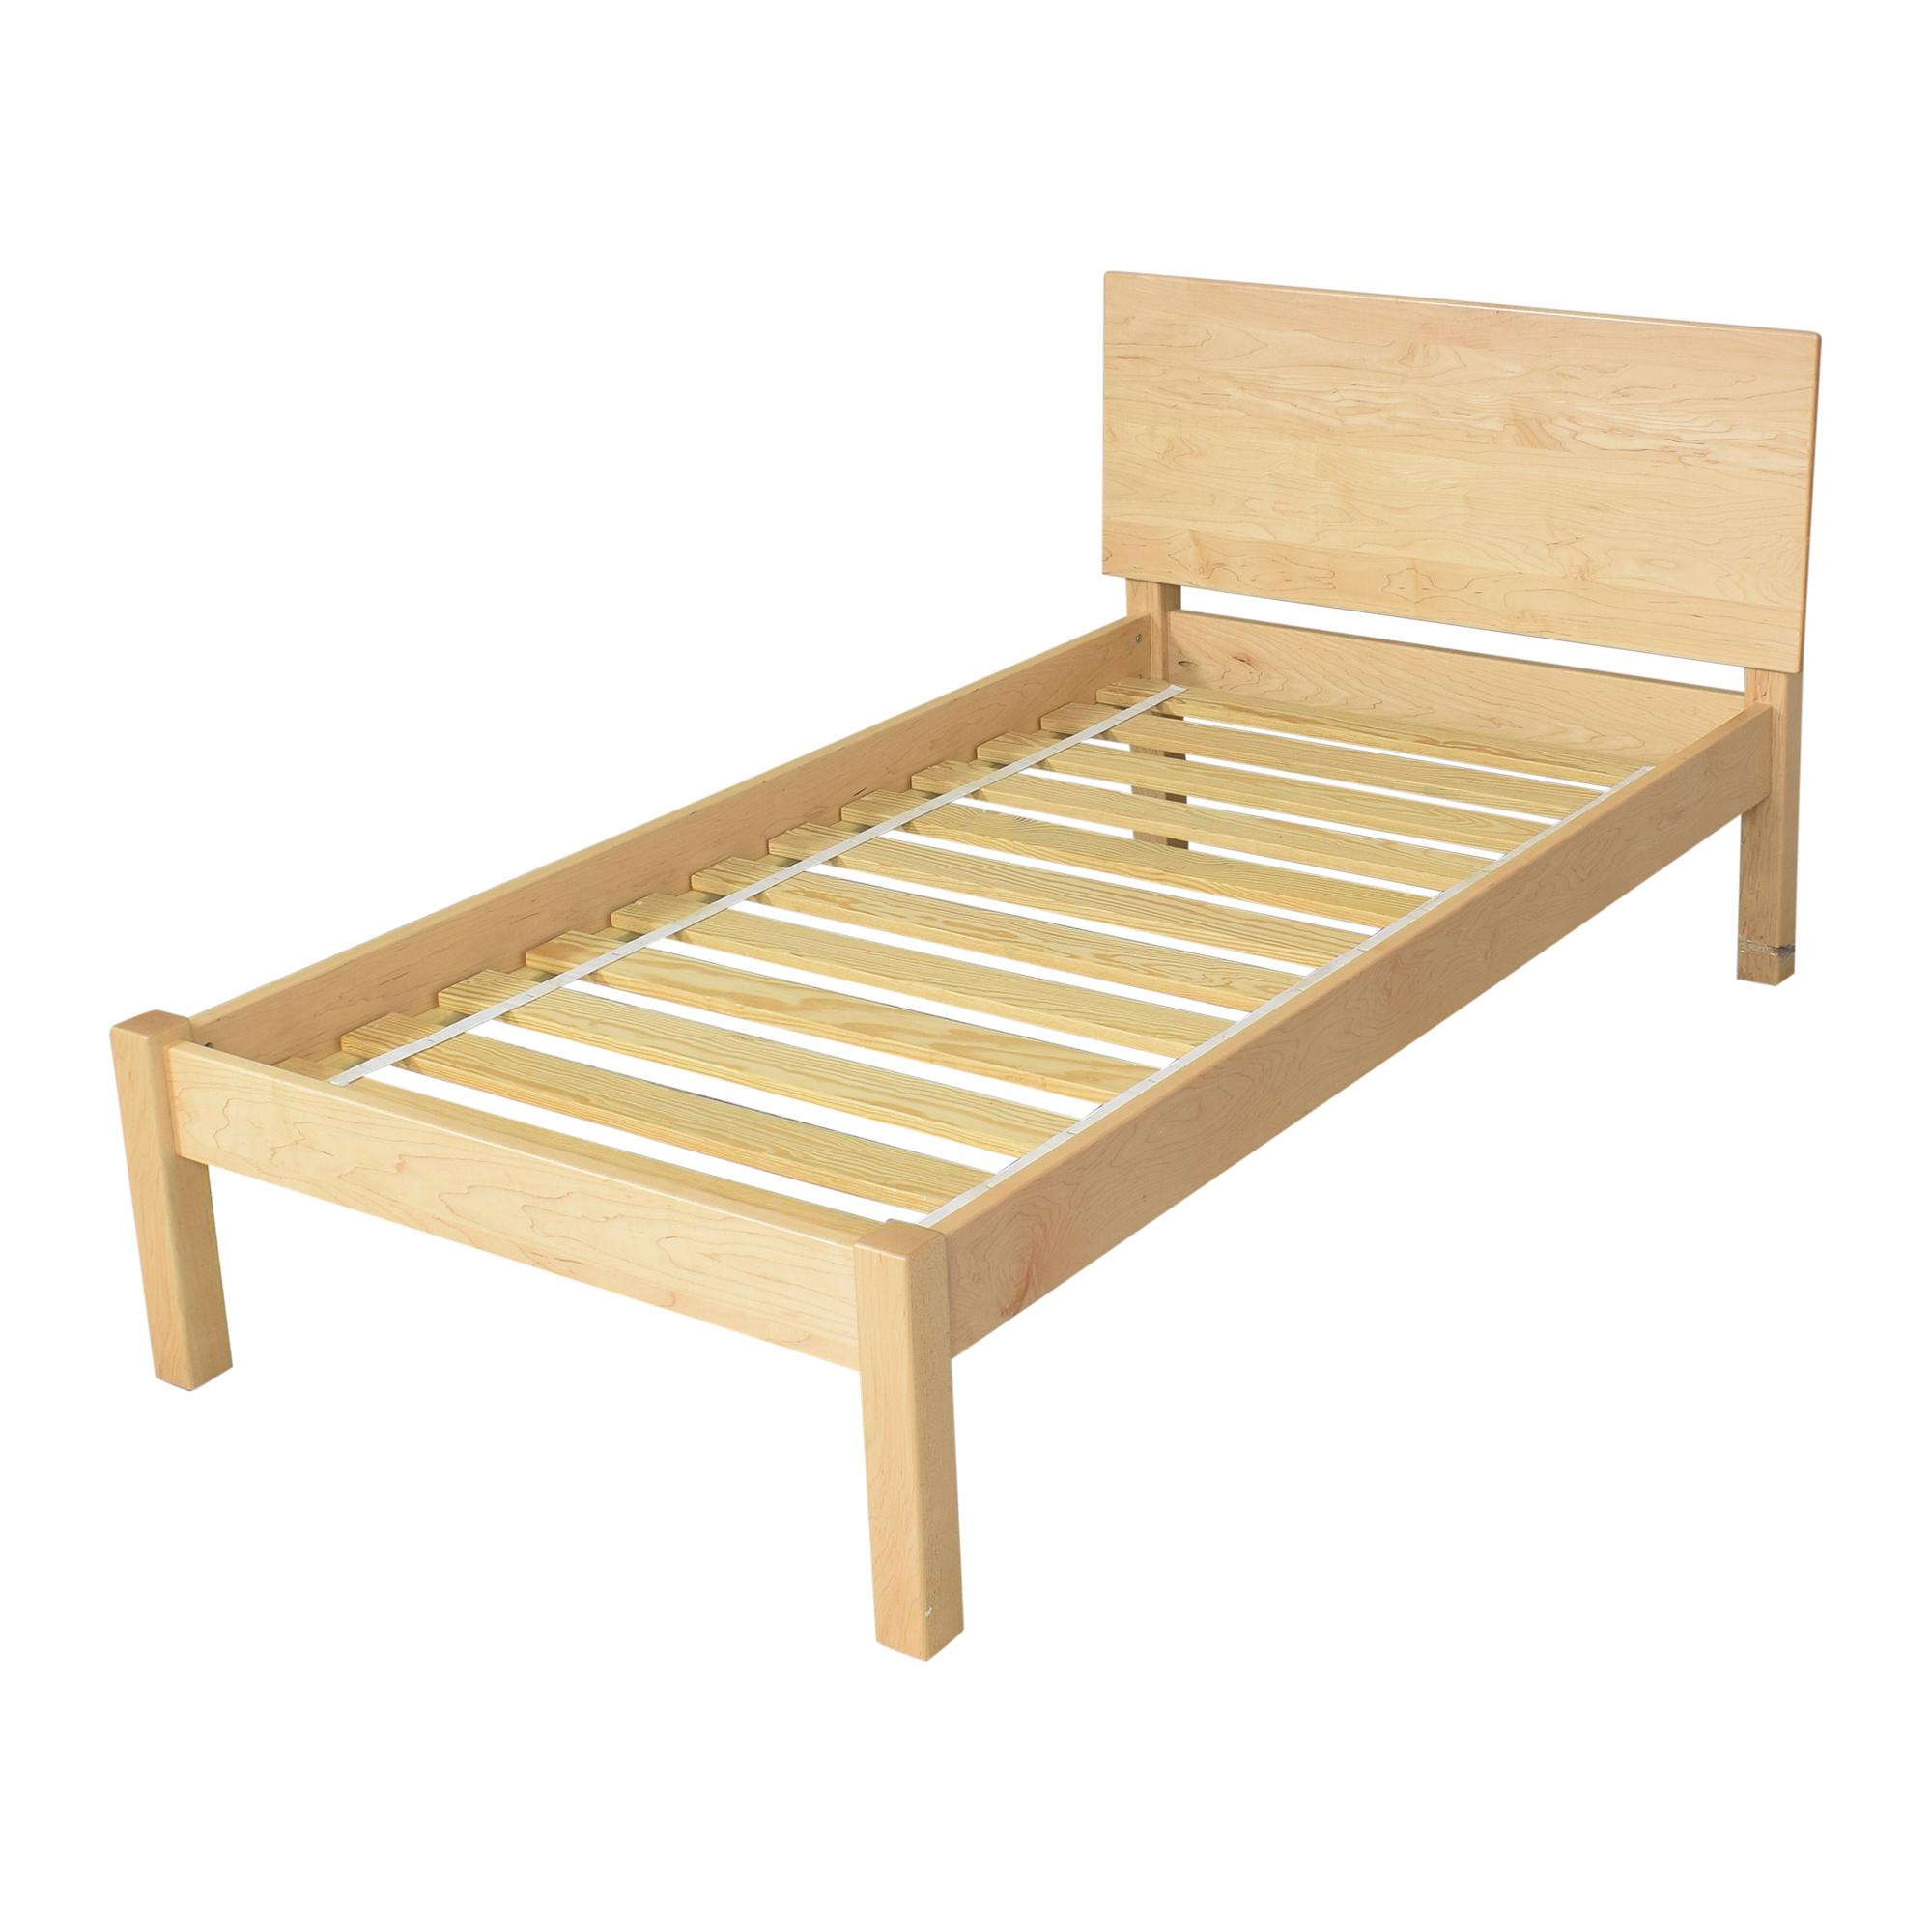 Room & Board Room & Board Pogo Twin Bed discount